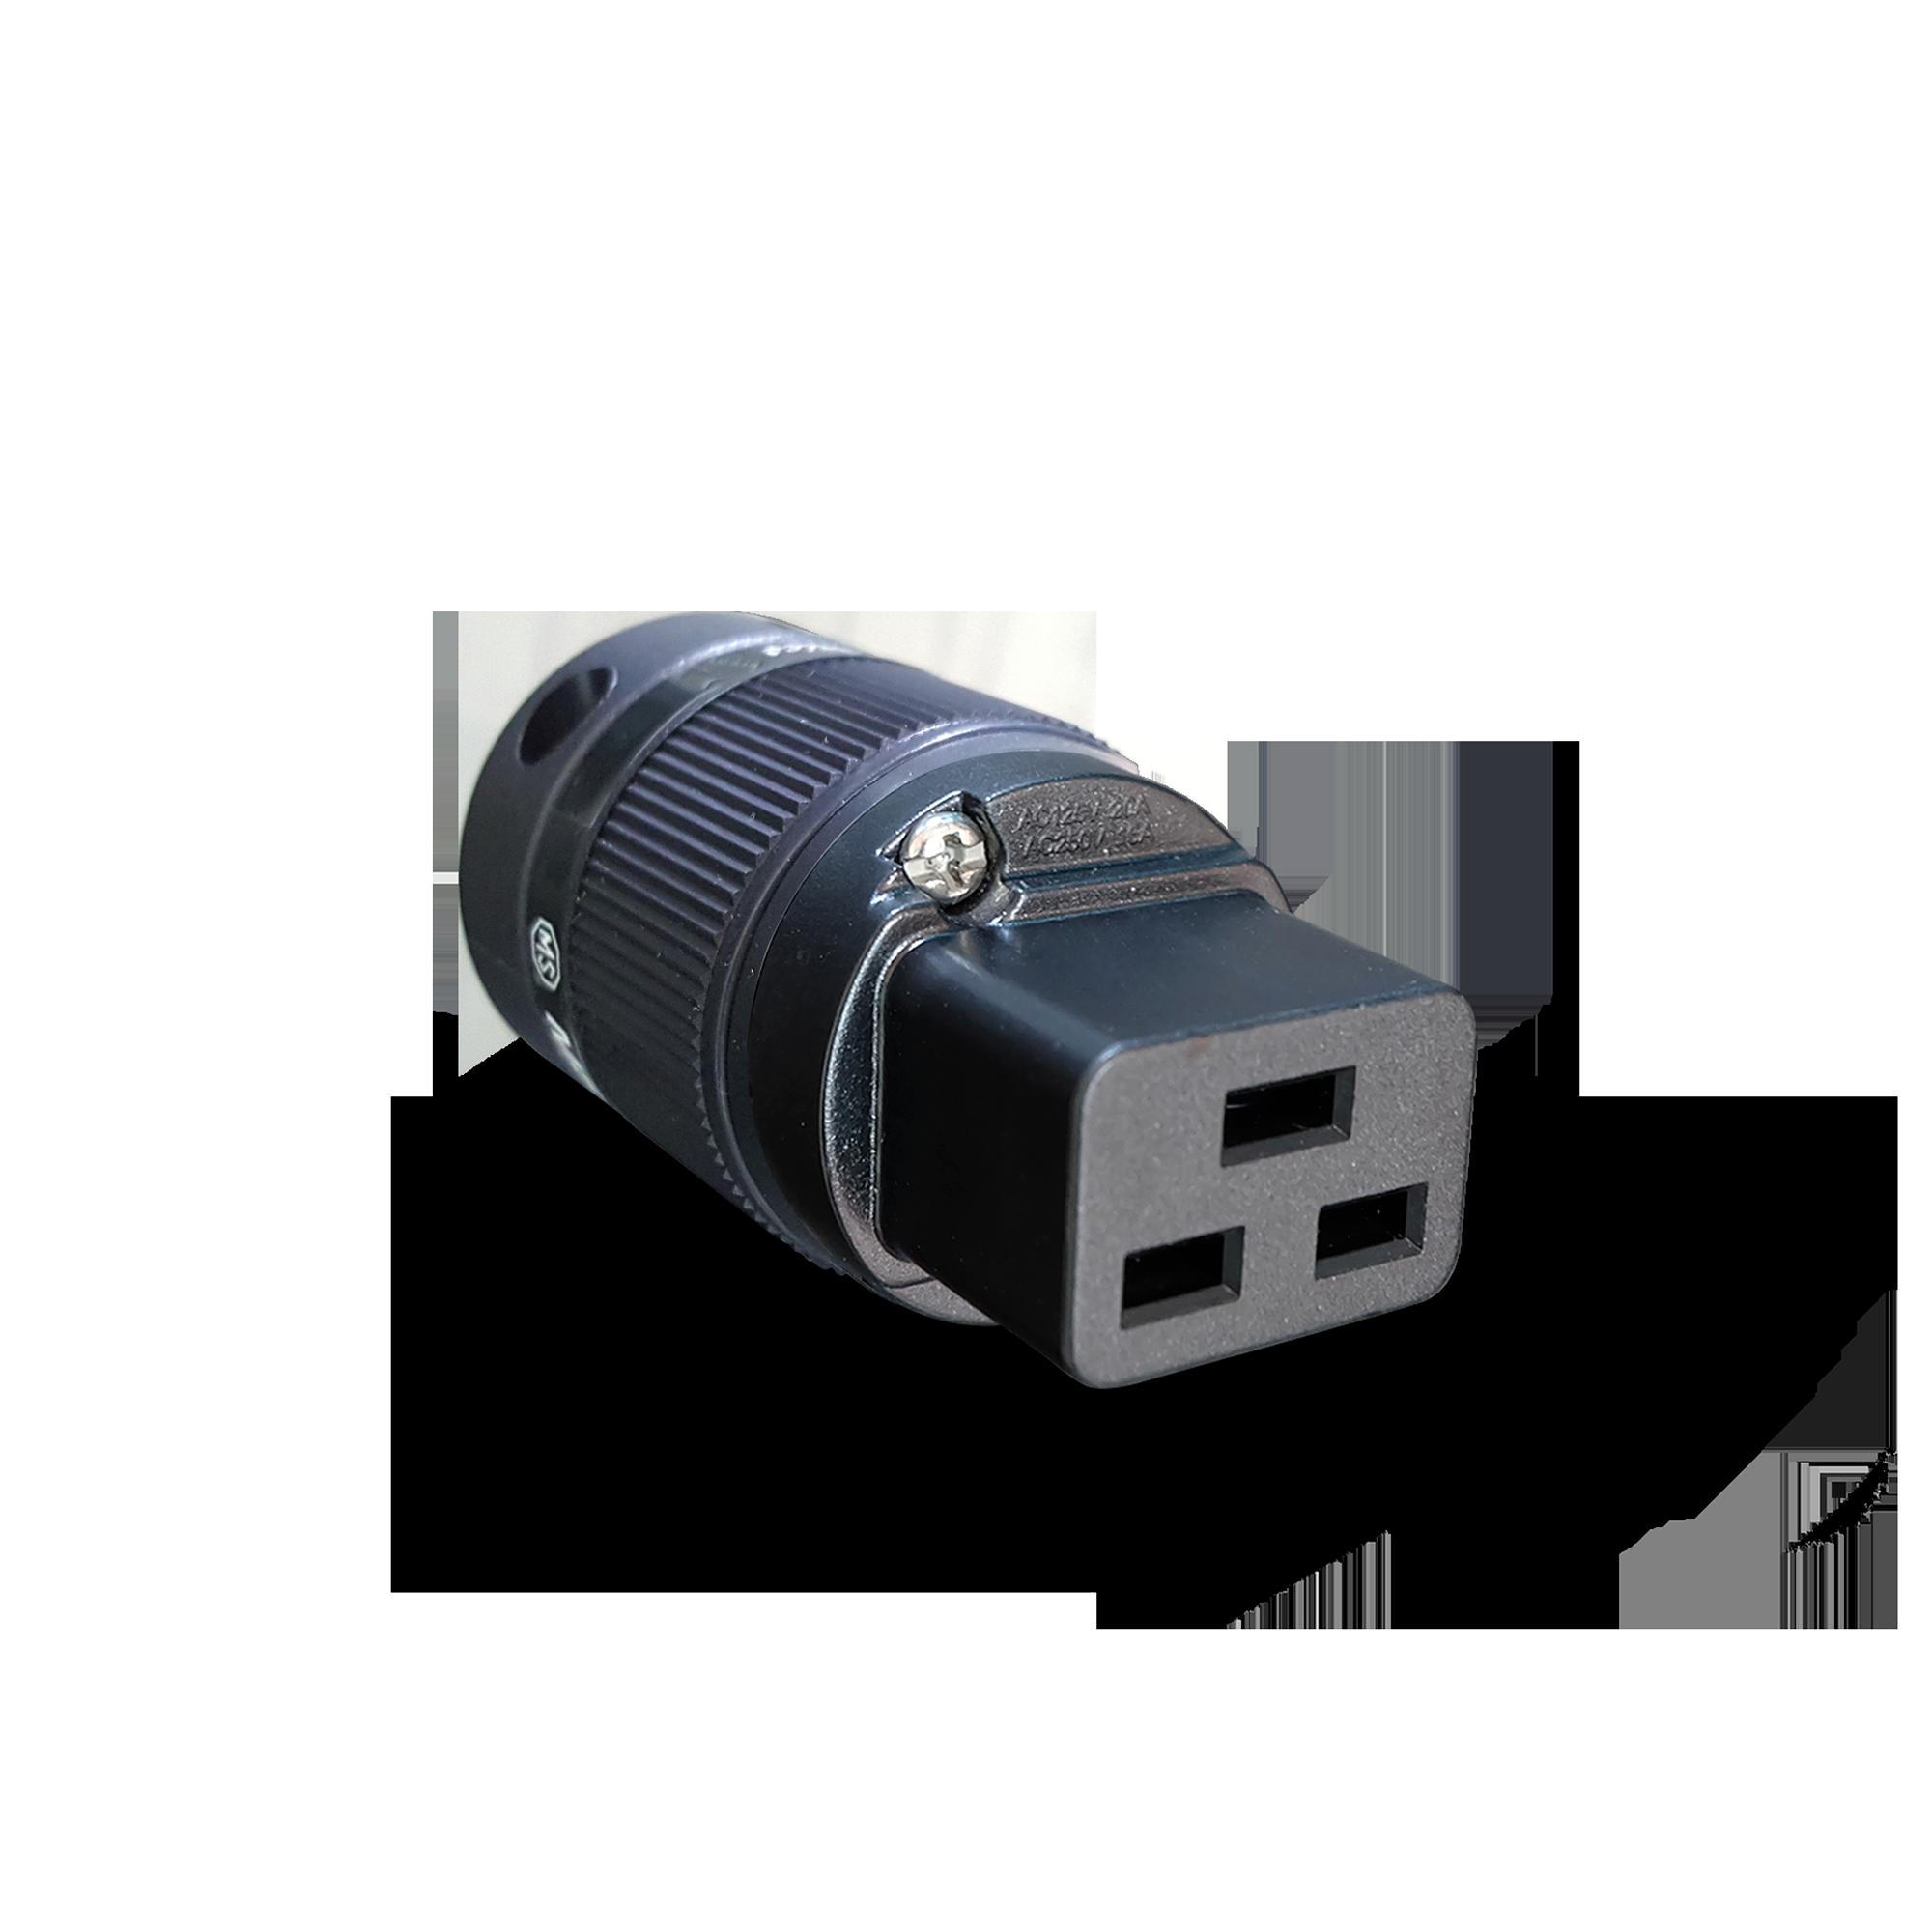 Shunyata Research Venom PS8, Venom Defender and (1) Venom NR12 C19 Power Cord Bundle